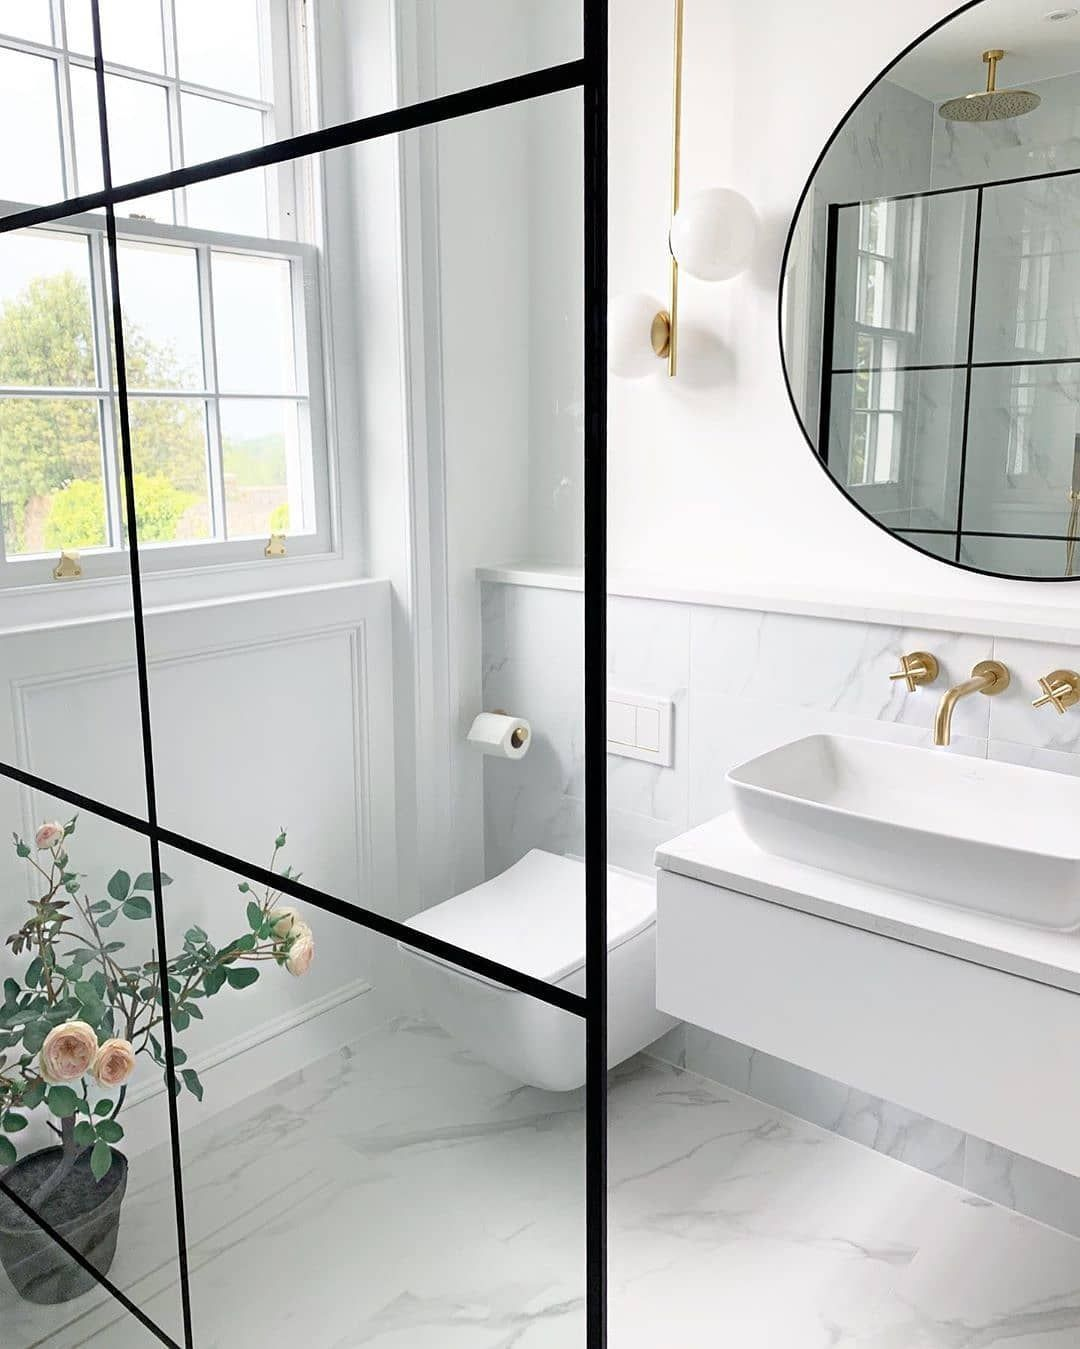 West Elm Uk On Instagram Bathroom Goals From Lovetearsandteepees Ft Our Sphere Stem Ceiling Lamp Monochrome Bathroom Loft Bathroom Bathroom Inspiration